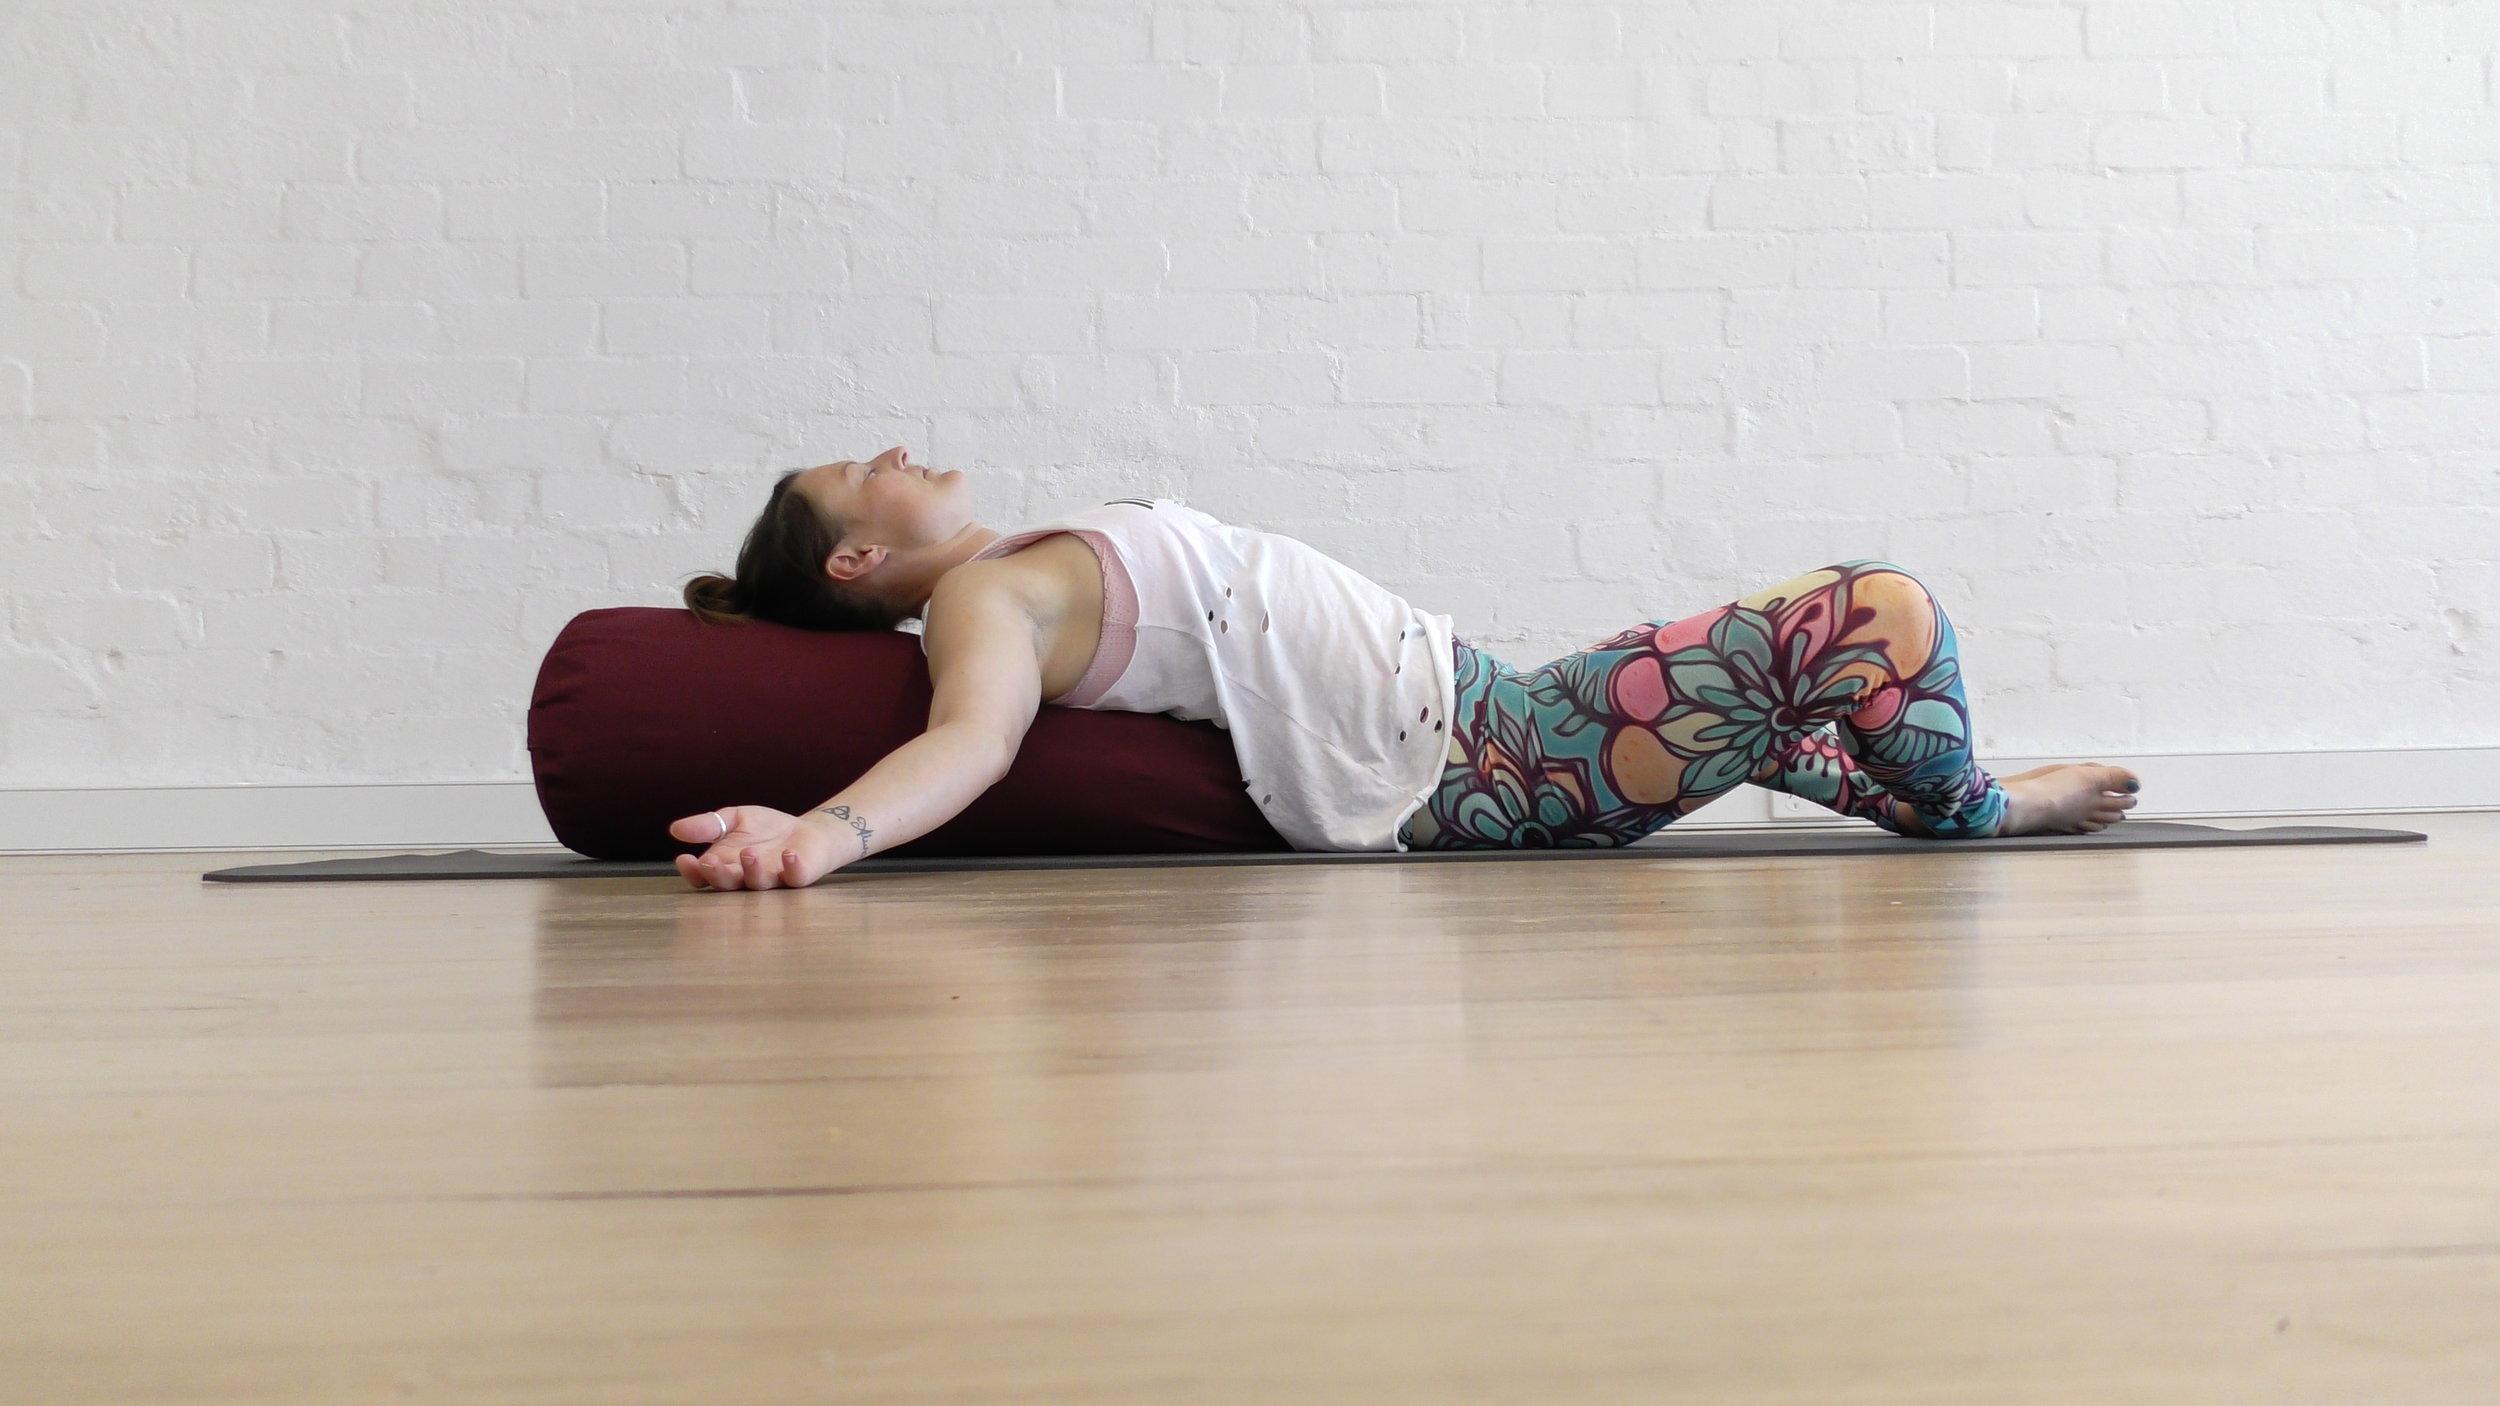 Yin Yoga - WHEN: SEASONAL, WEDNESDAY, THURSDAY, SUNDAYDURATION: 1 HOUR